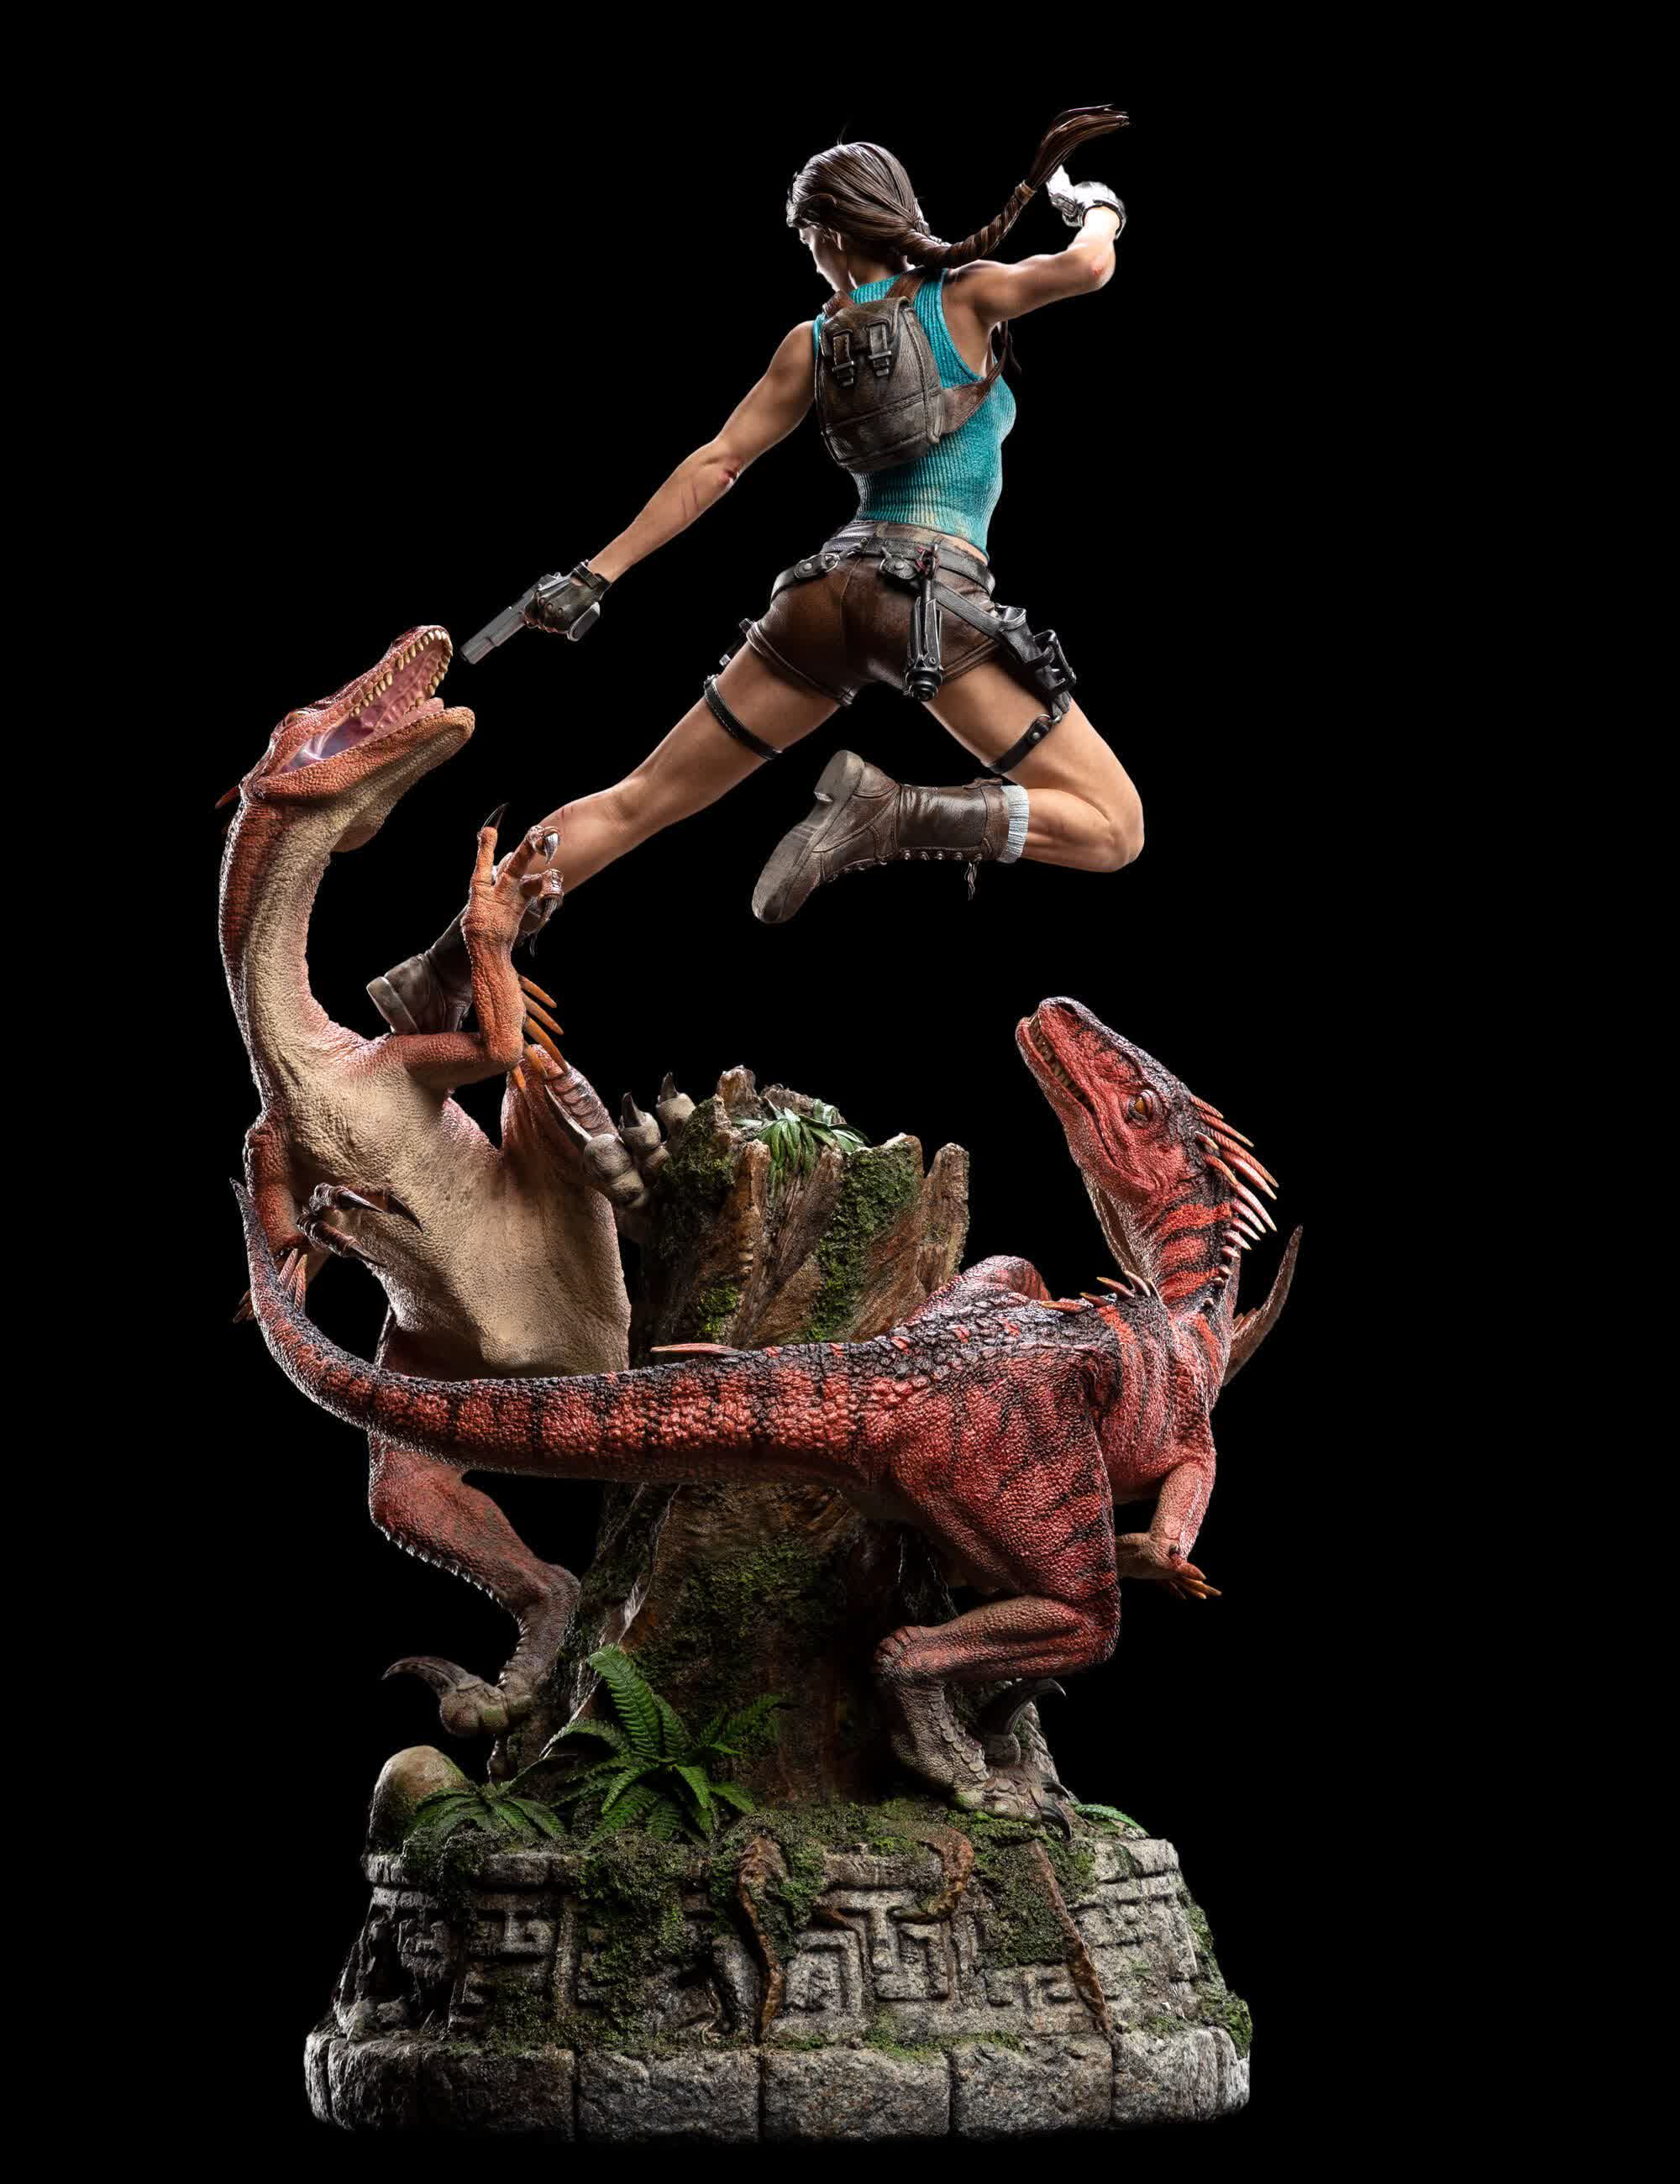 1619013073 368 Weta Workshop devoile la figurine de 1500 de Lara